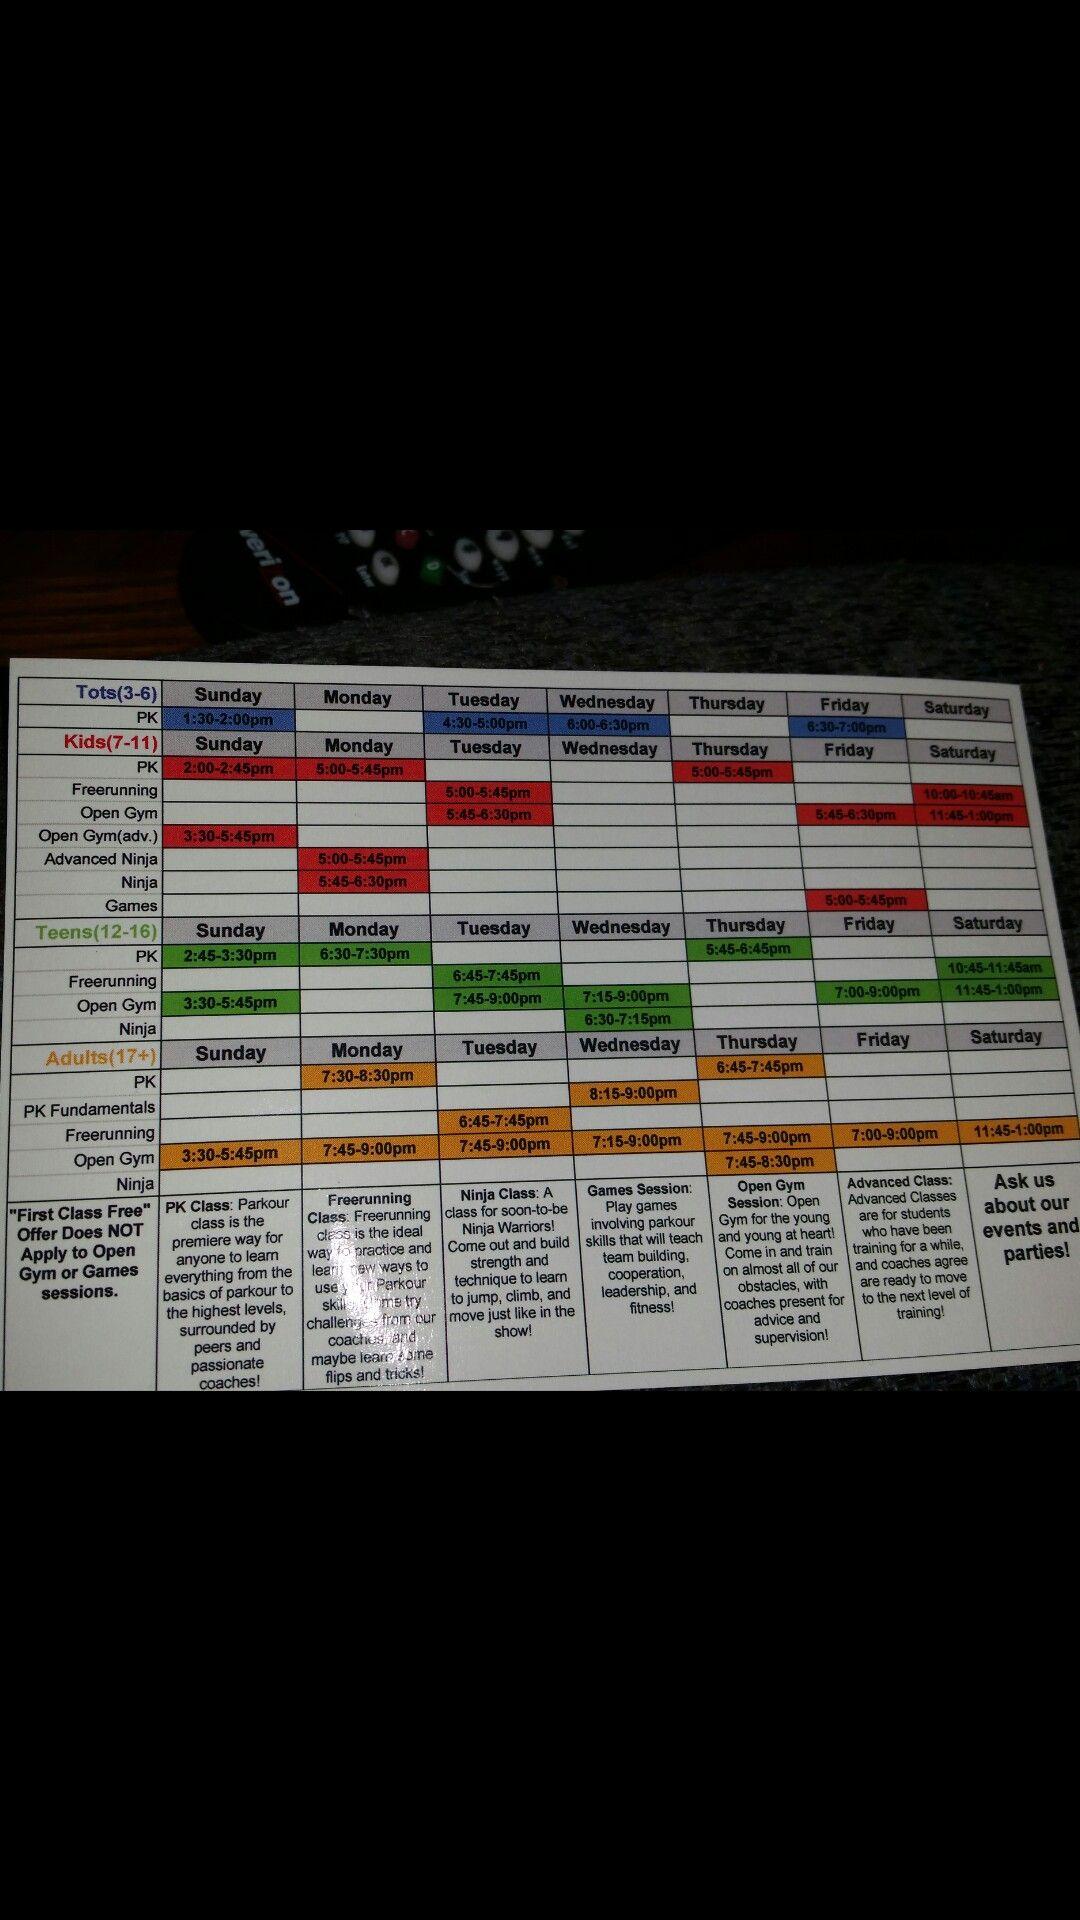 2017 PPK schedule for Washington Township gym.